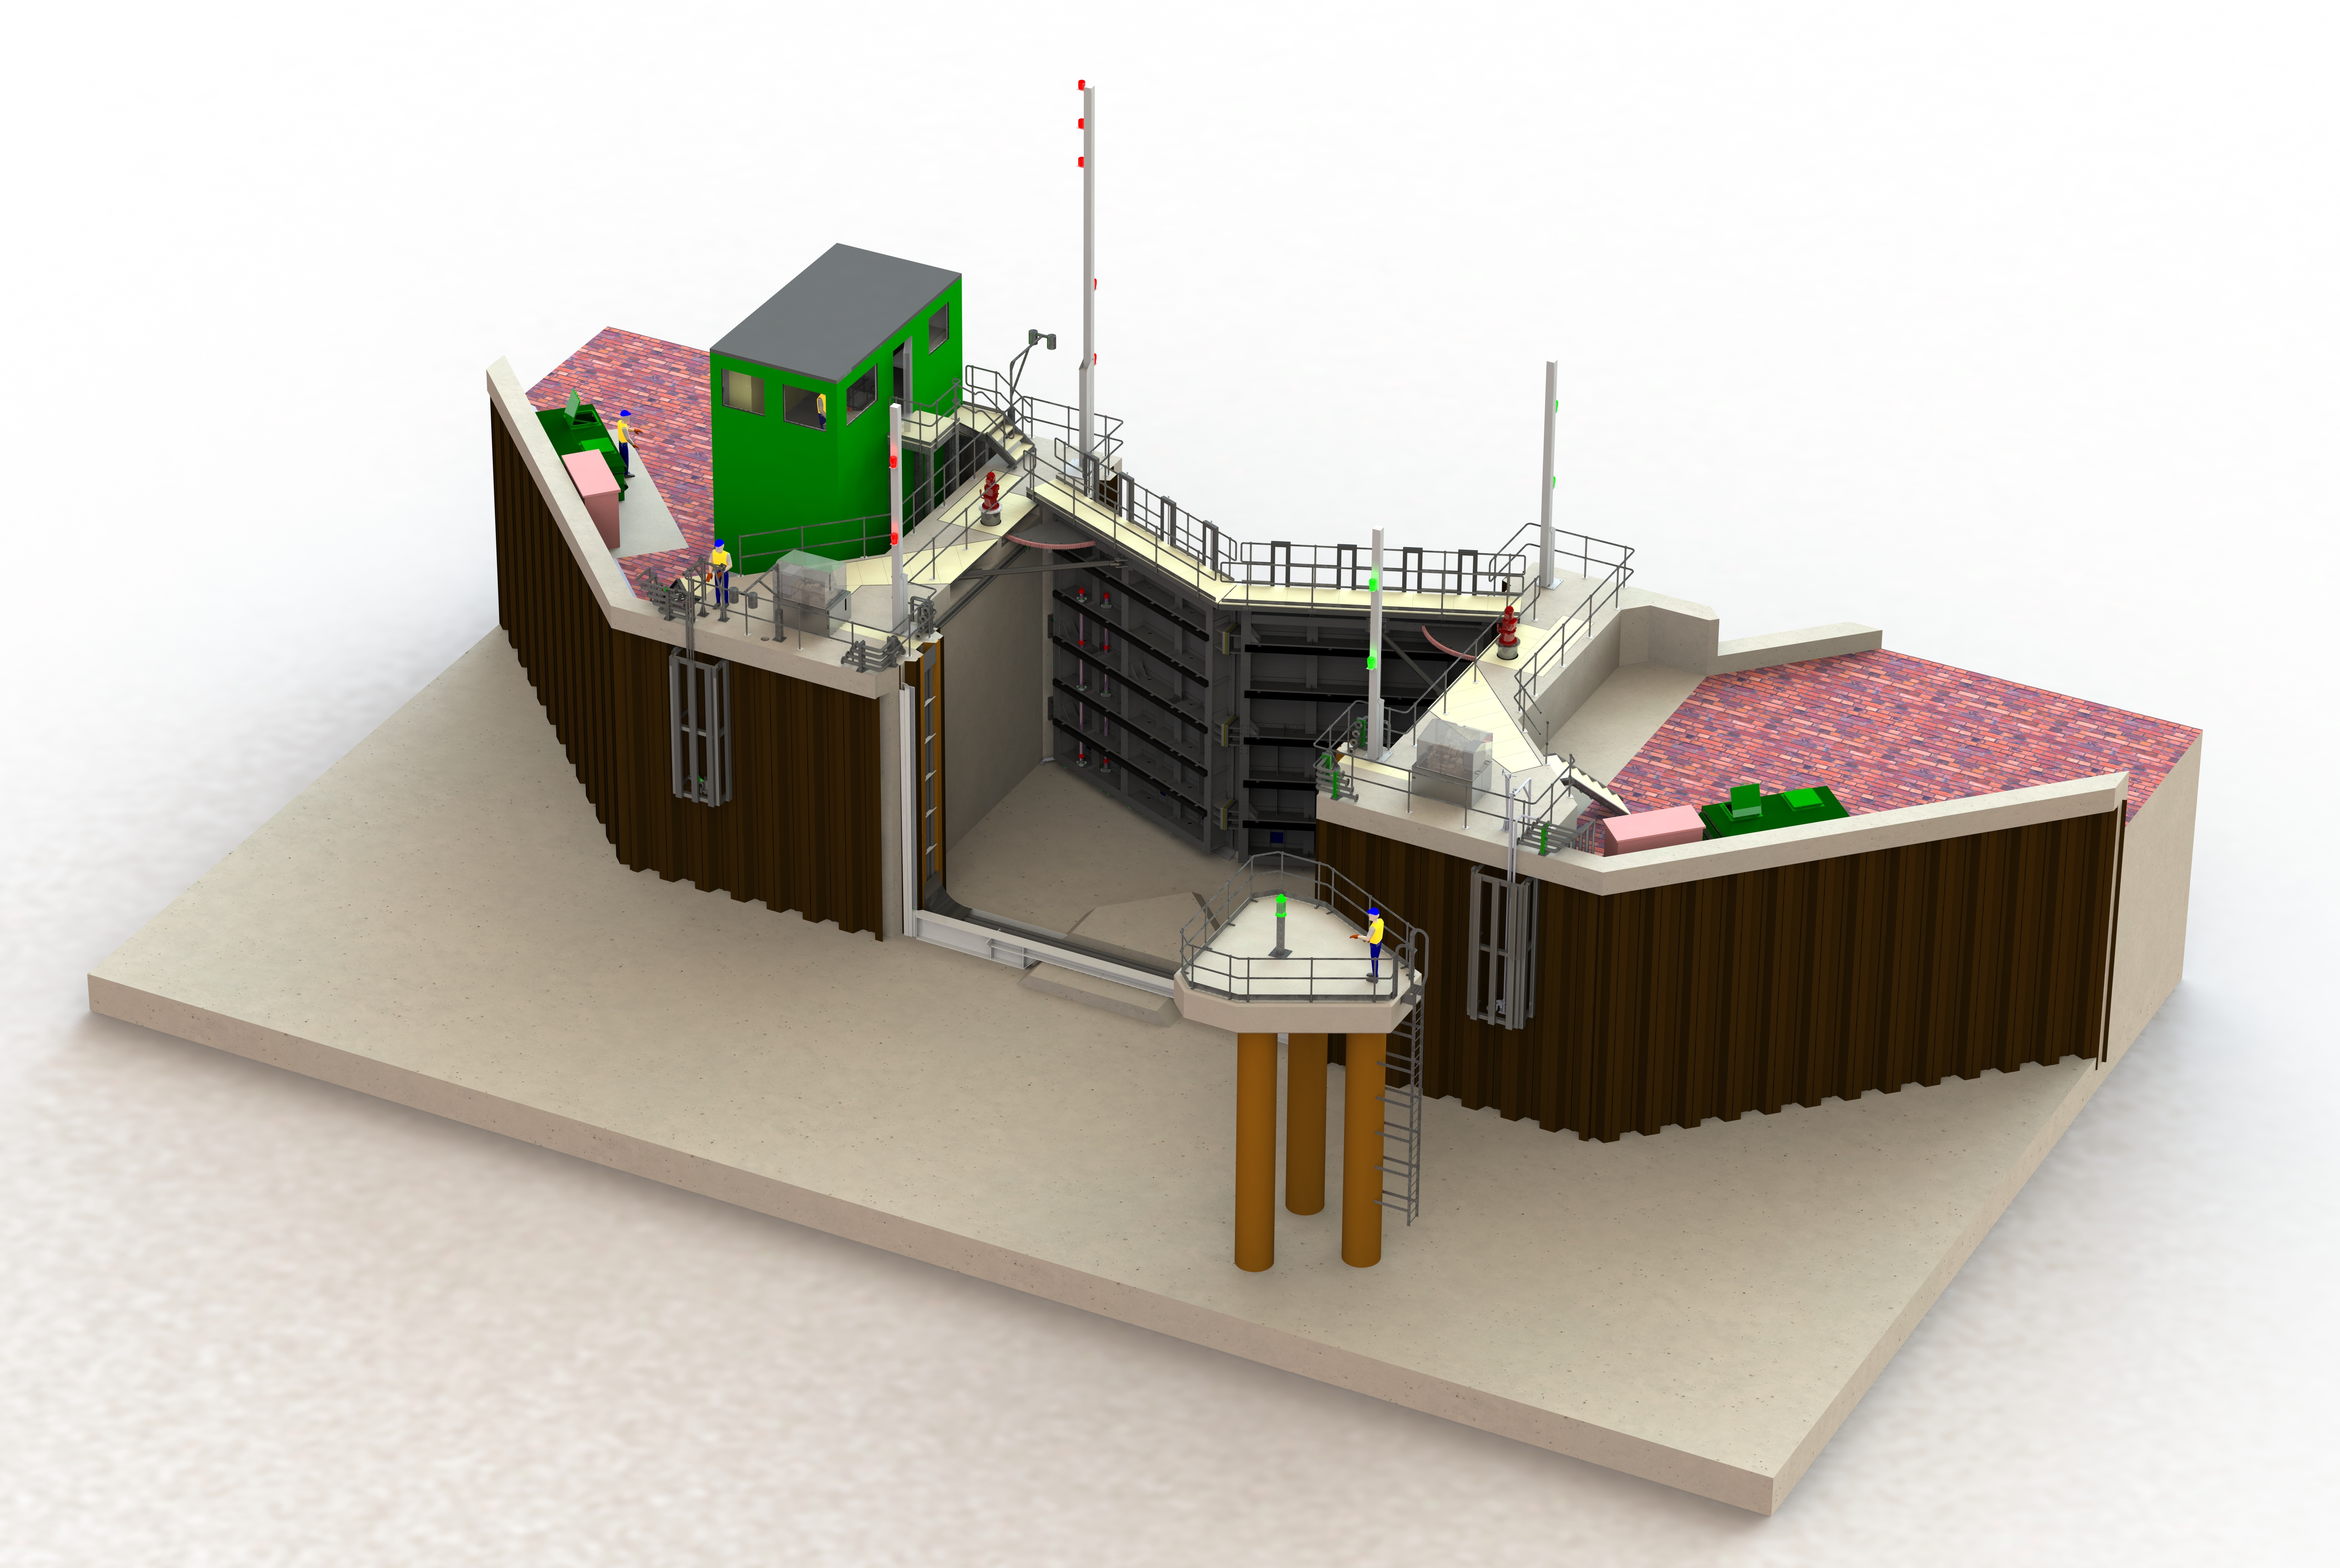 Design and Analysis - Hunton Engineering